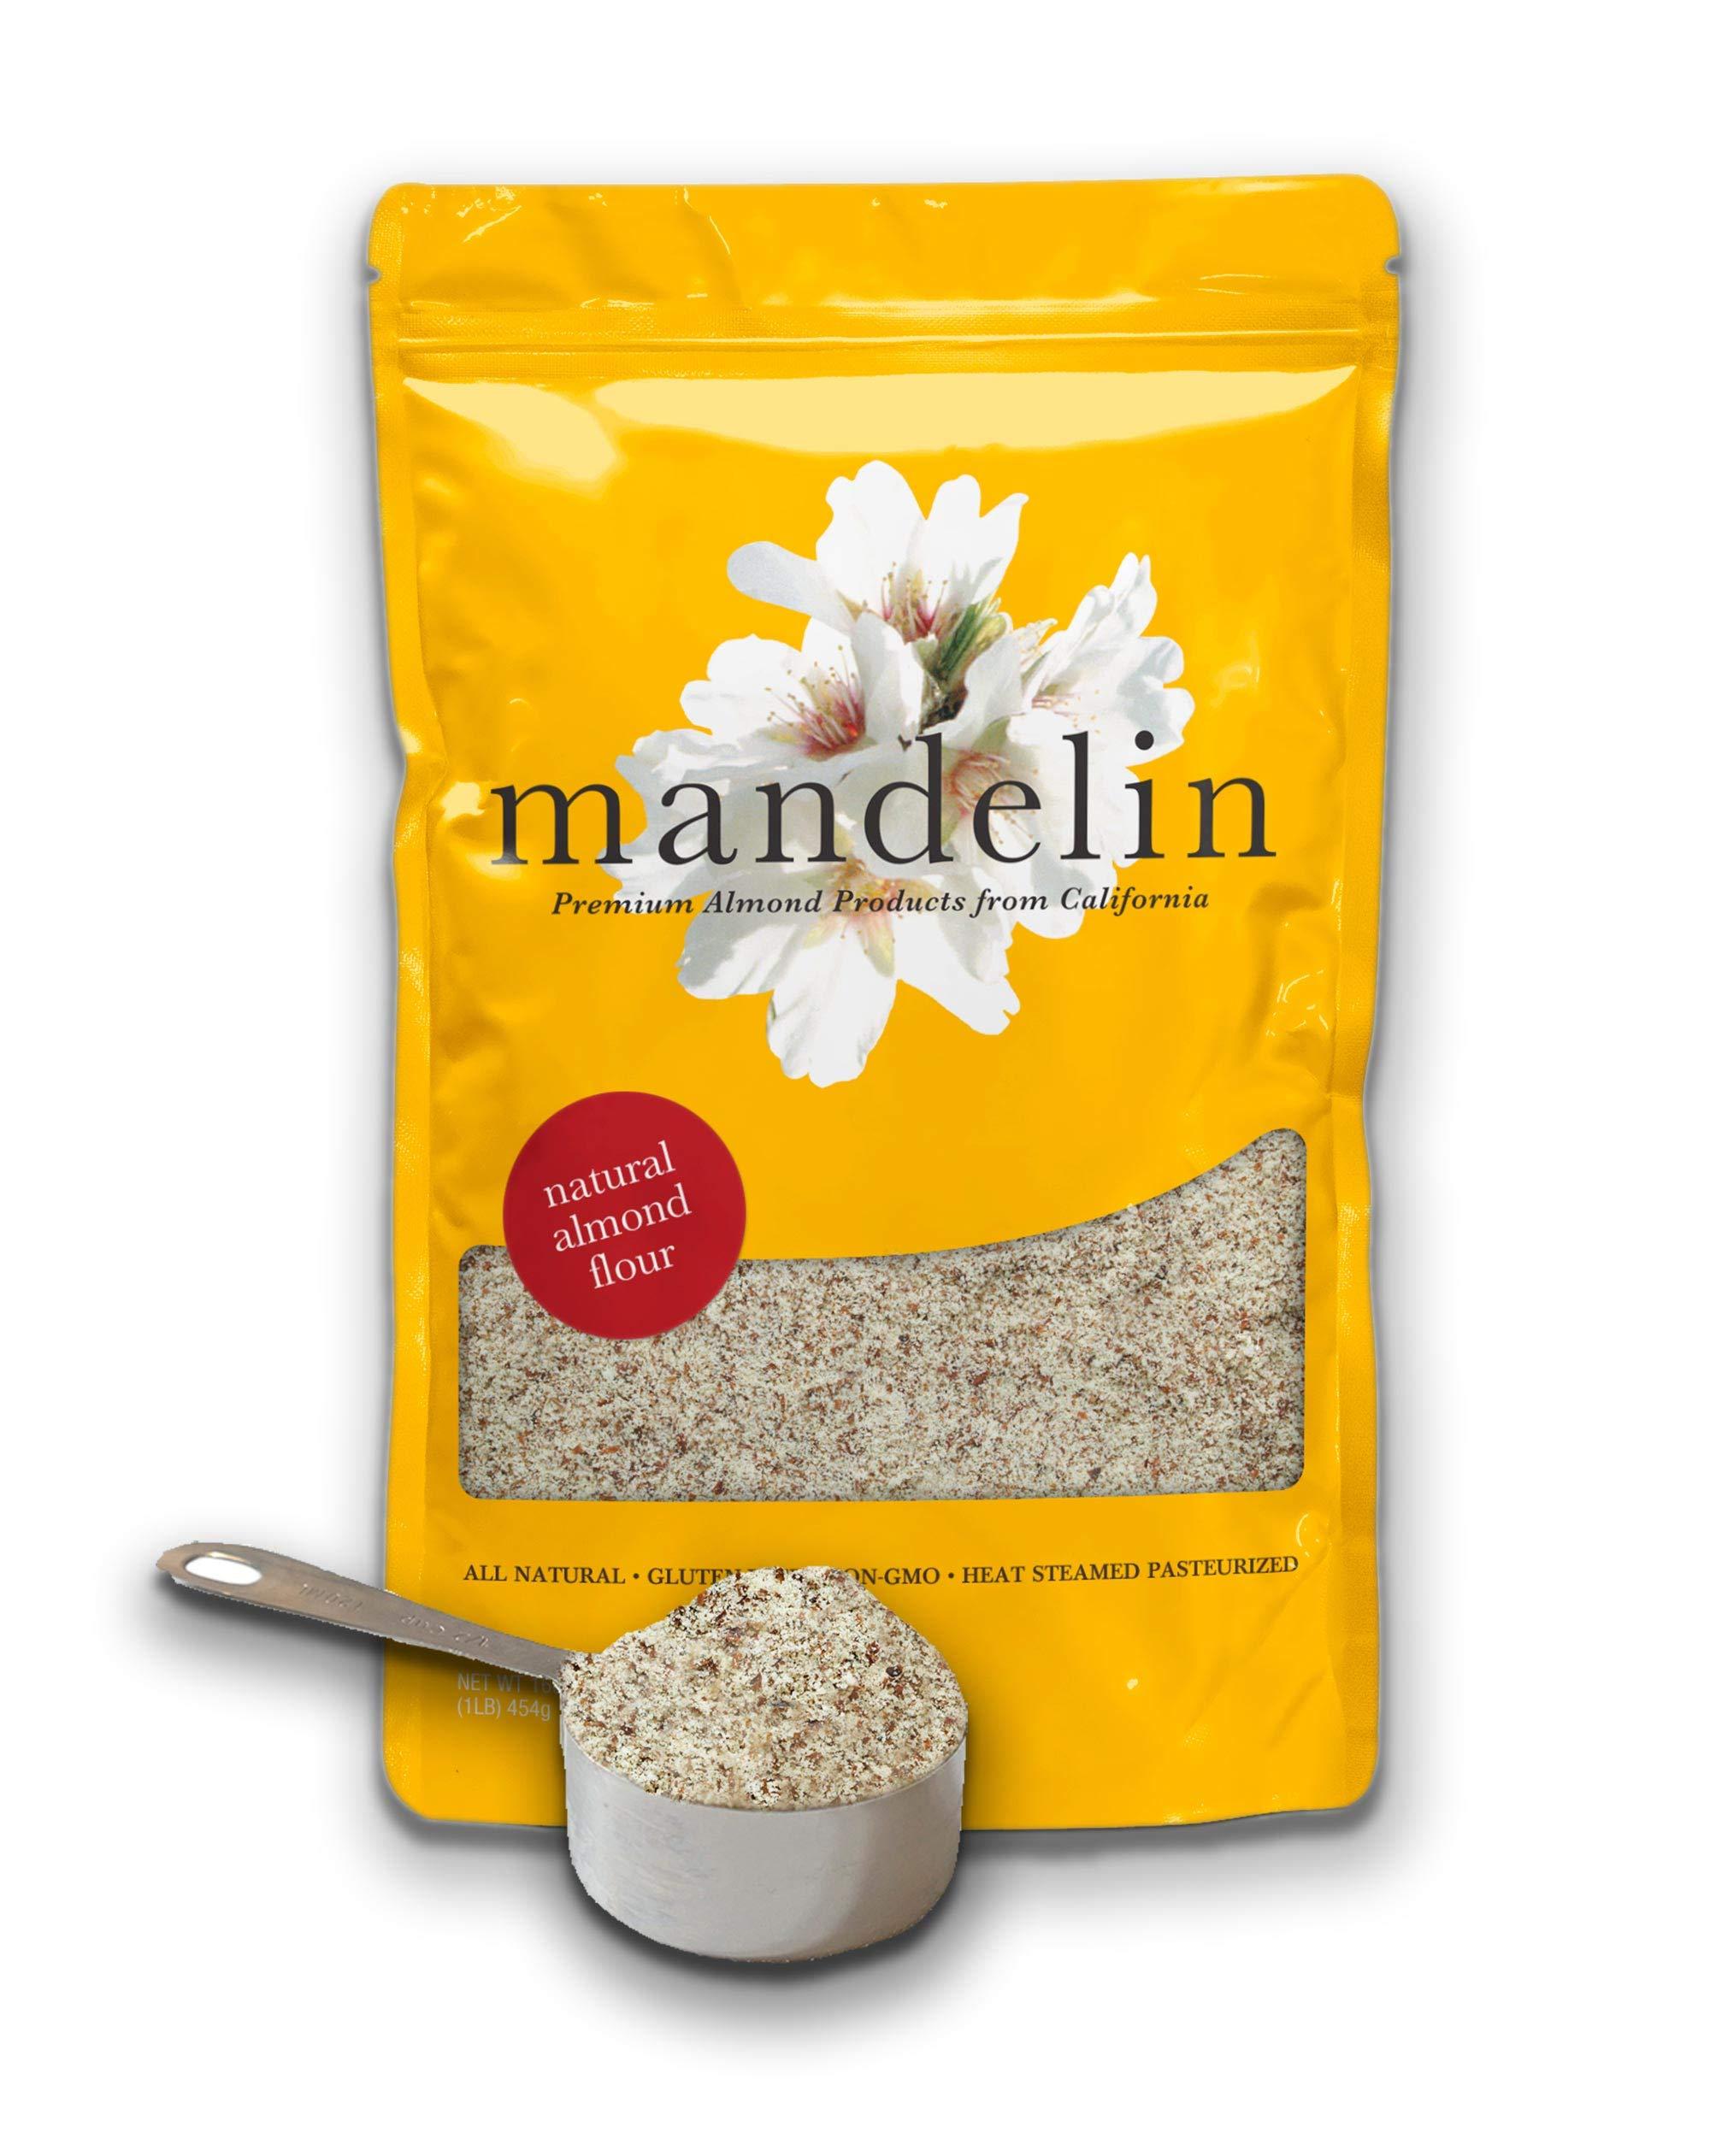 Mandelin Fresh Natural Almond Flour - 1 lb 100% Almond Flour / Meal, Super Fine Mill, With Skin, Non-GMO, Gluten Free, Vegan, Keto, Plant Based Diet Friendly (16 oz)